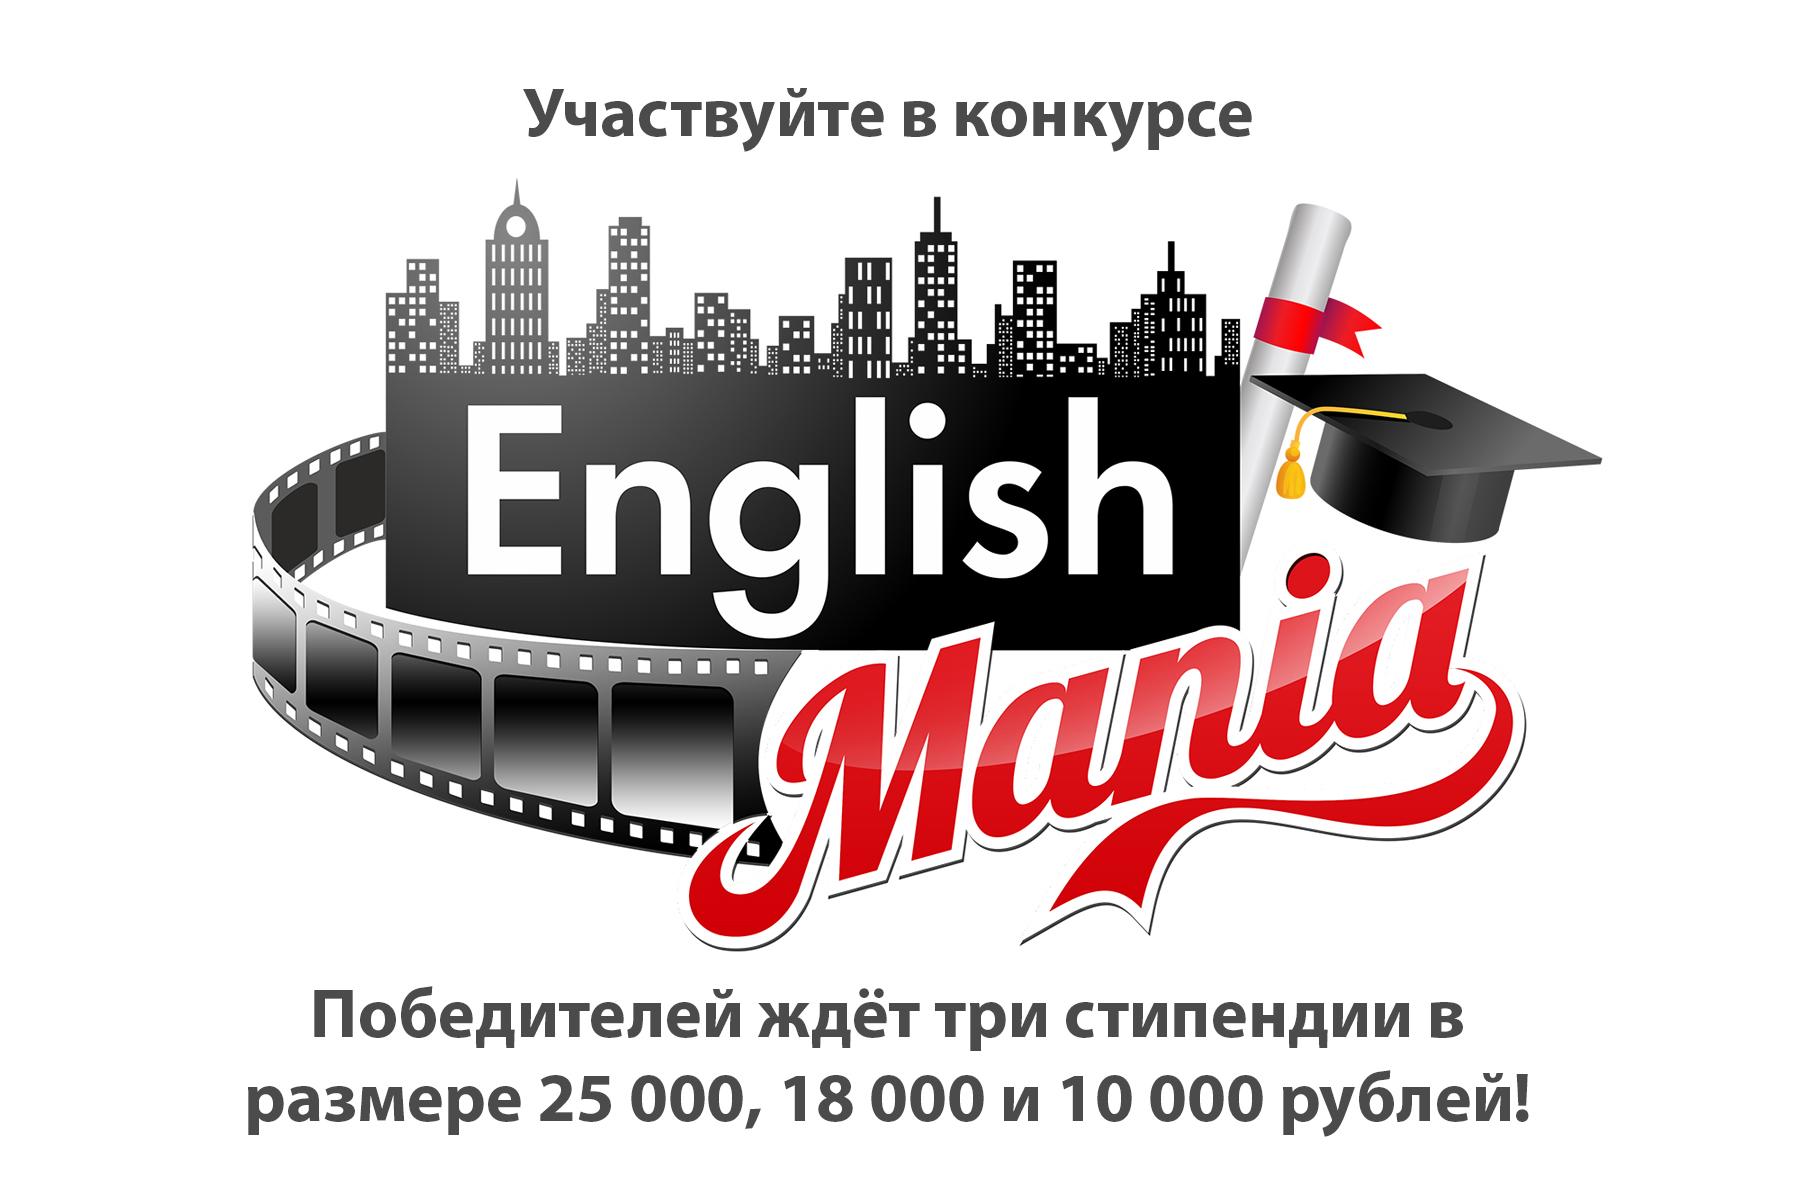 English Mania 2019